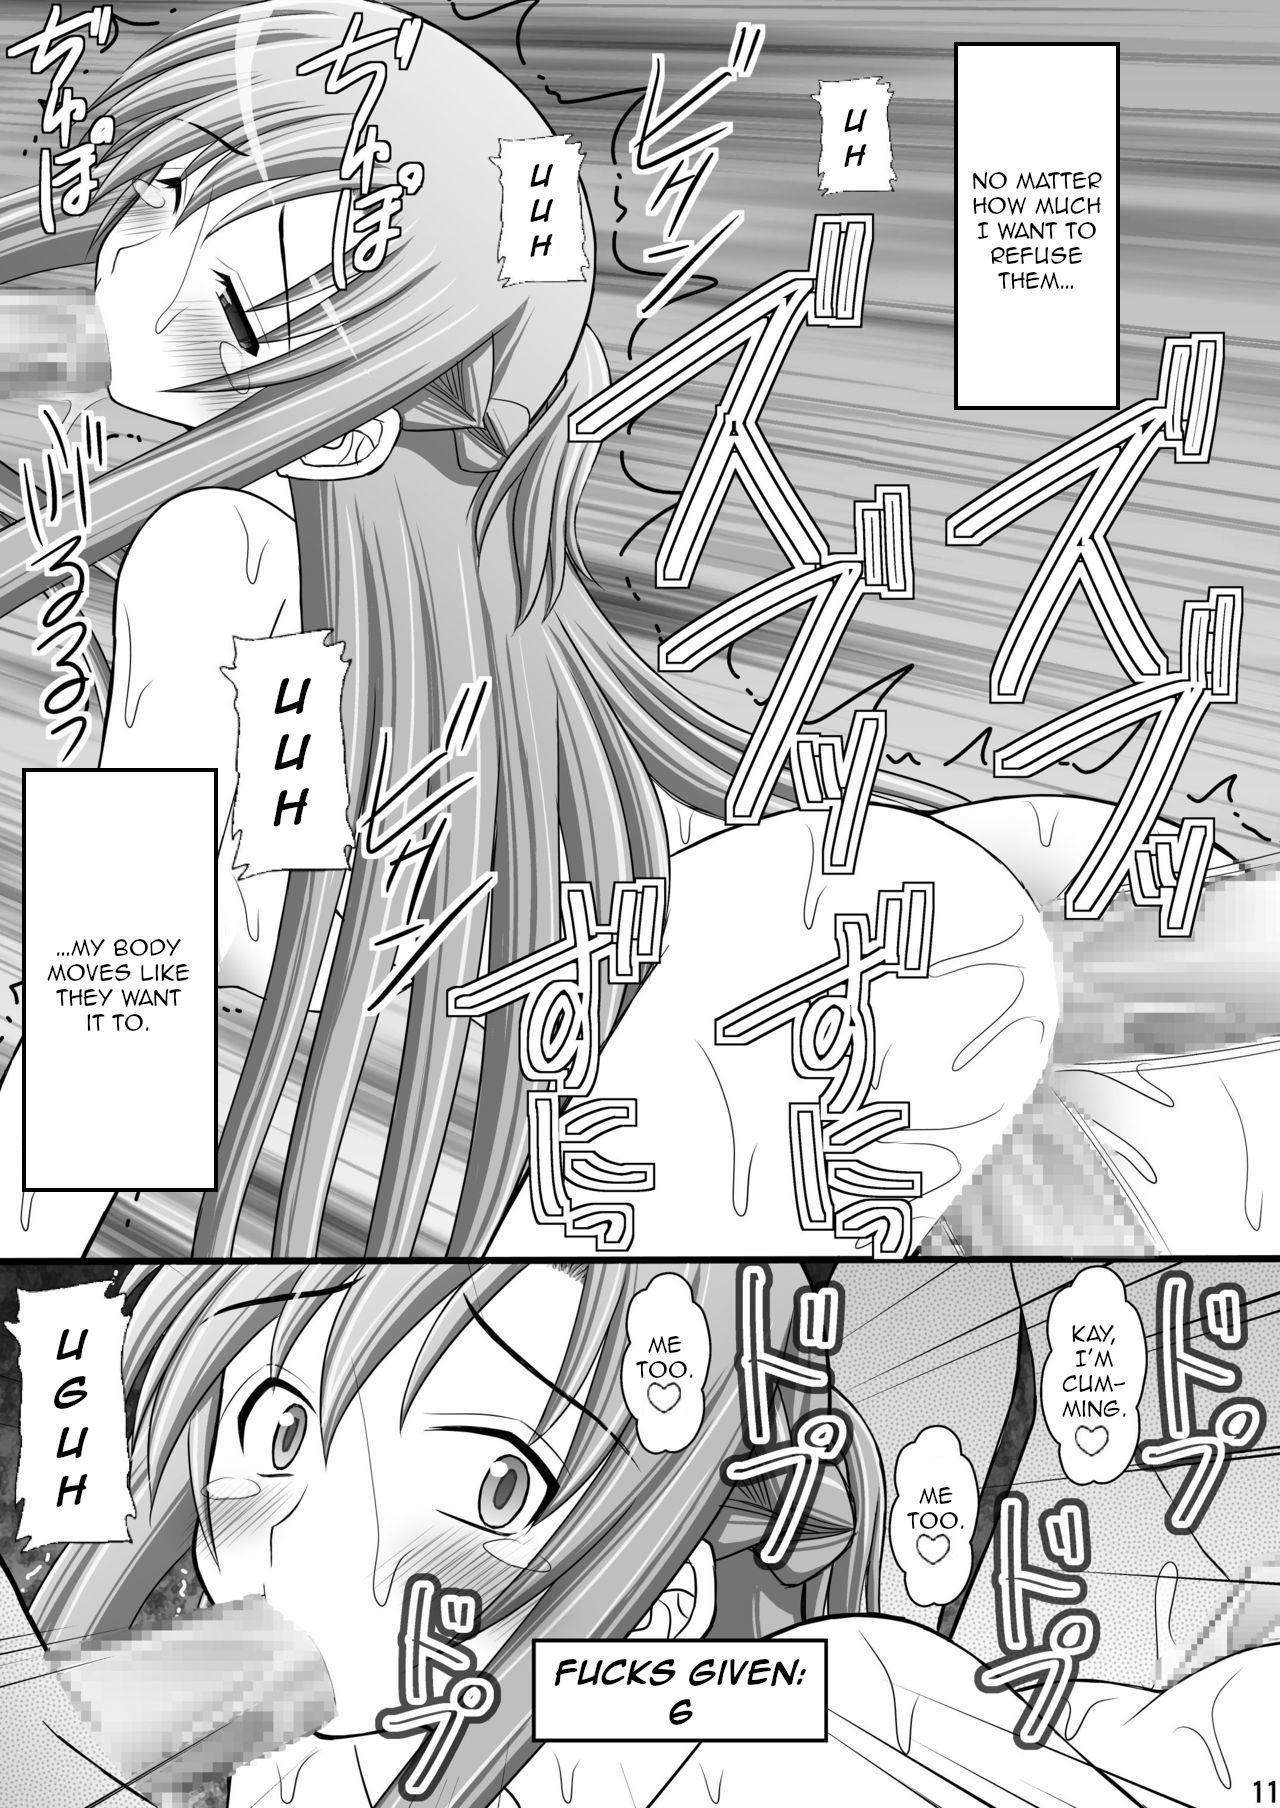 [Asanoya (Kittsu)] Toraware Hime III - Asuna Nakadashi 100-nin Dekiru ka na   Hostage Princess III (Sword Art Online) [English] [HypnoMangaEditor] [Digital] 9